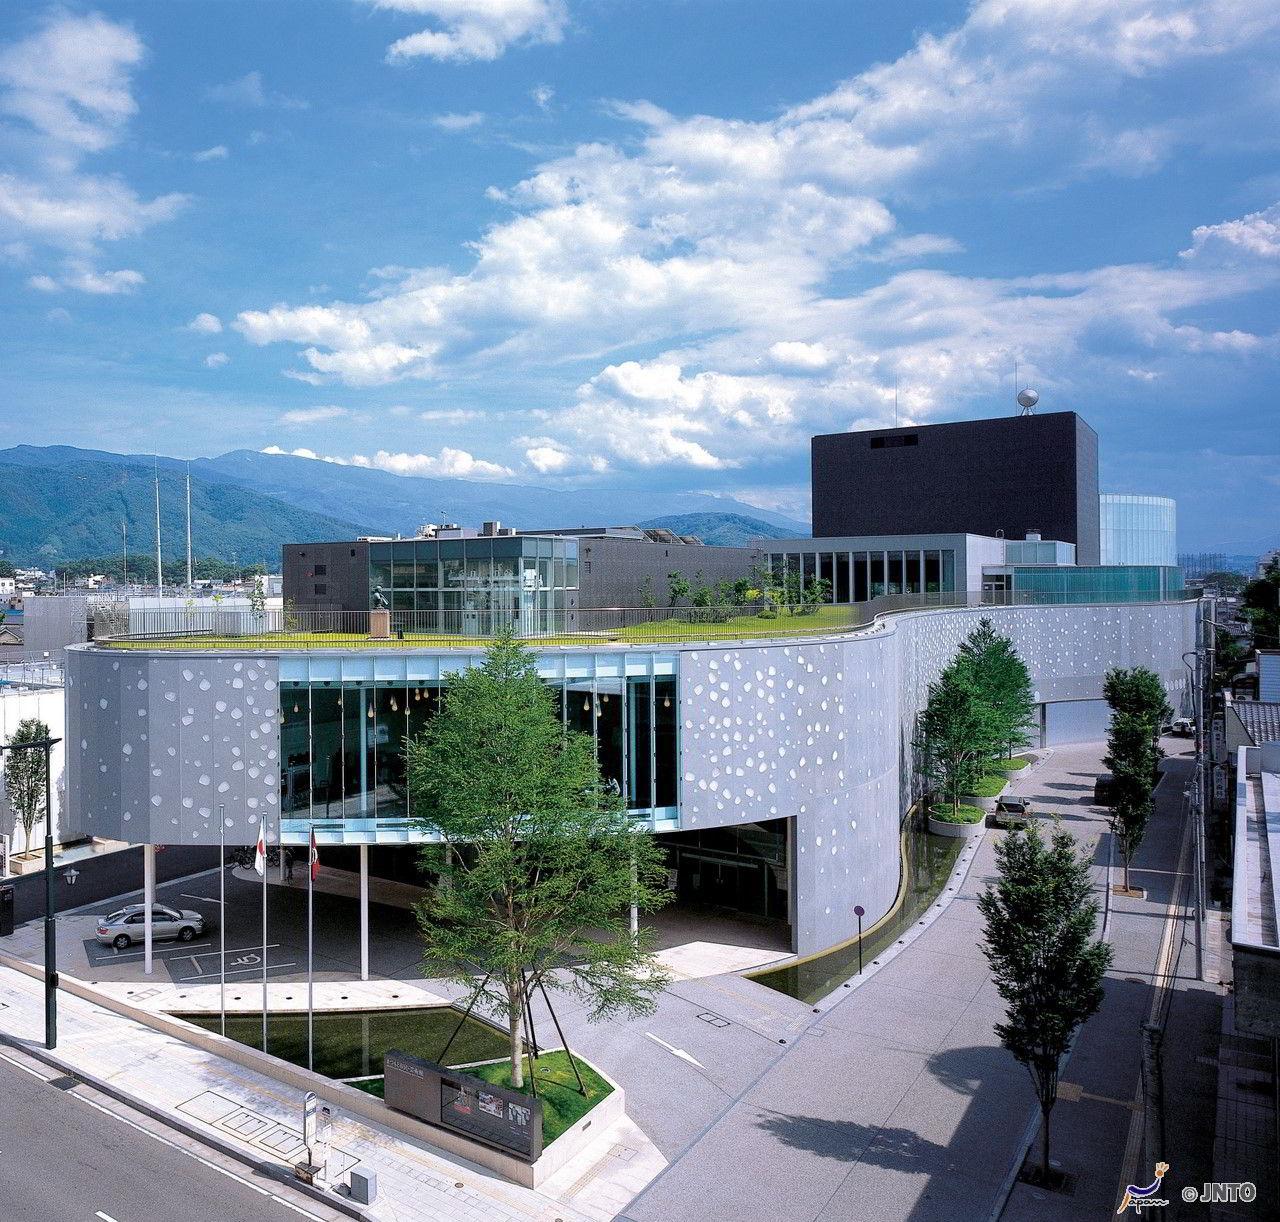 matsumoto-performing-arts-centre